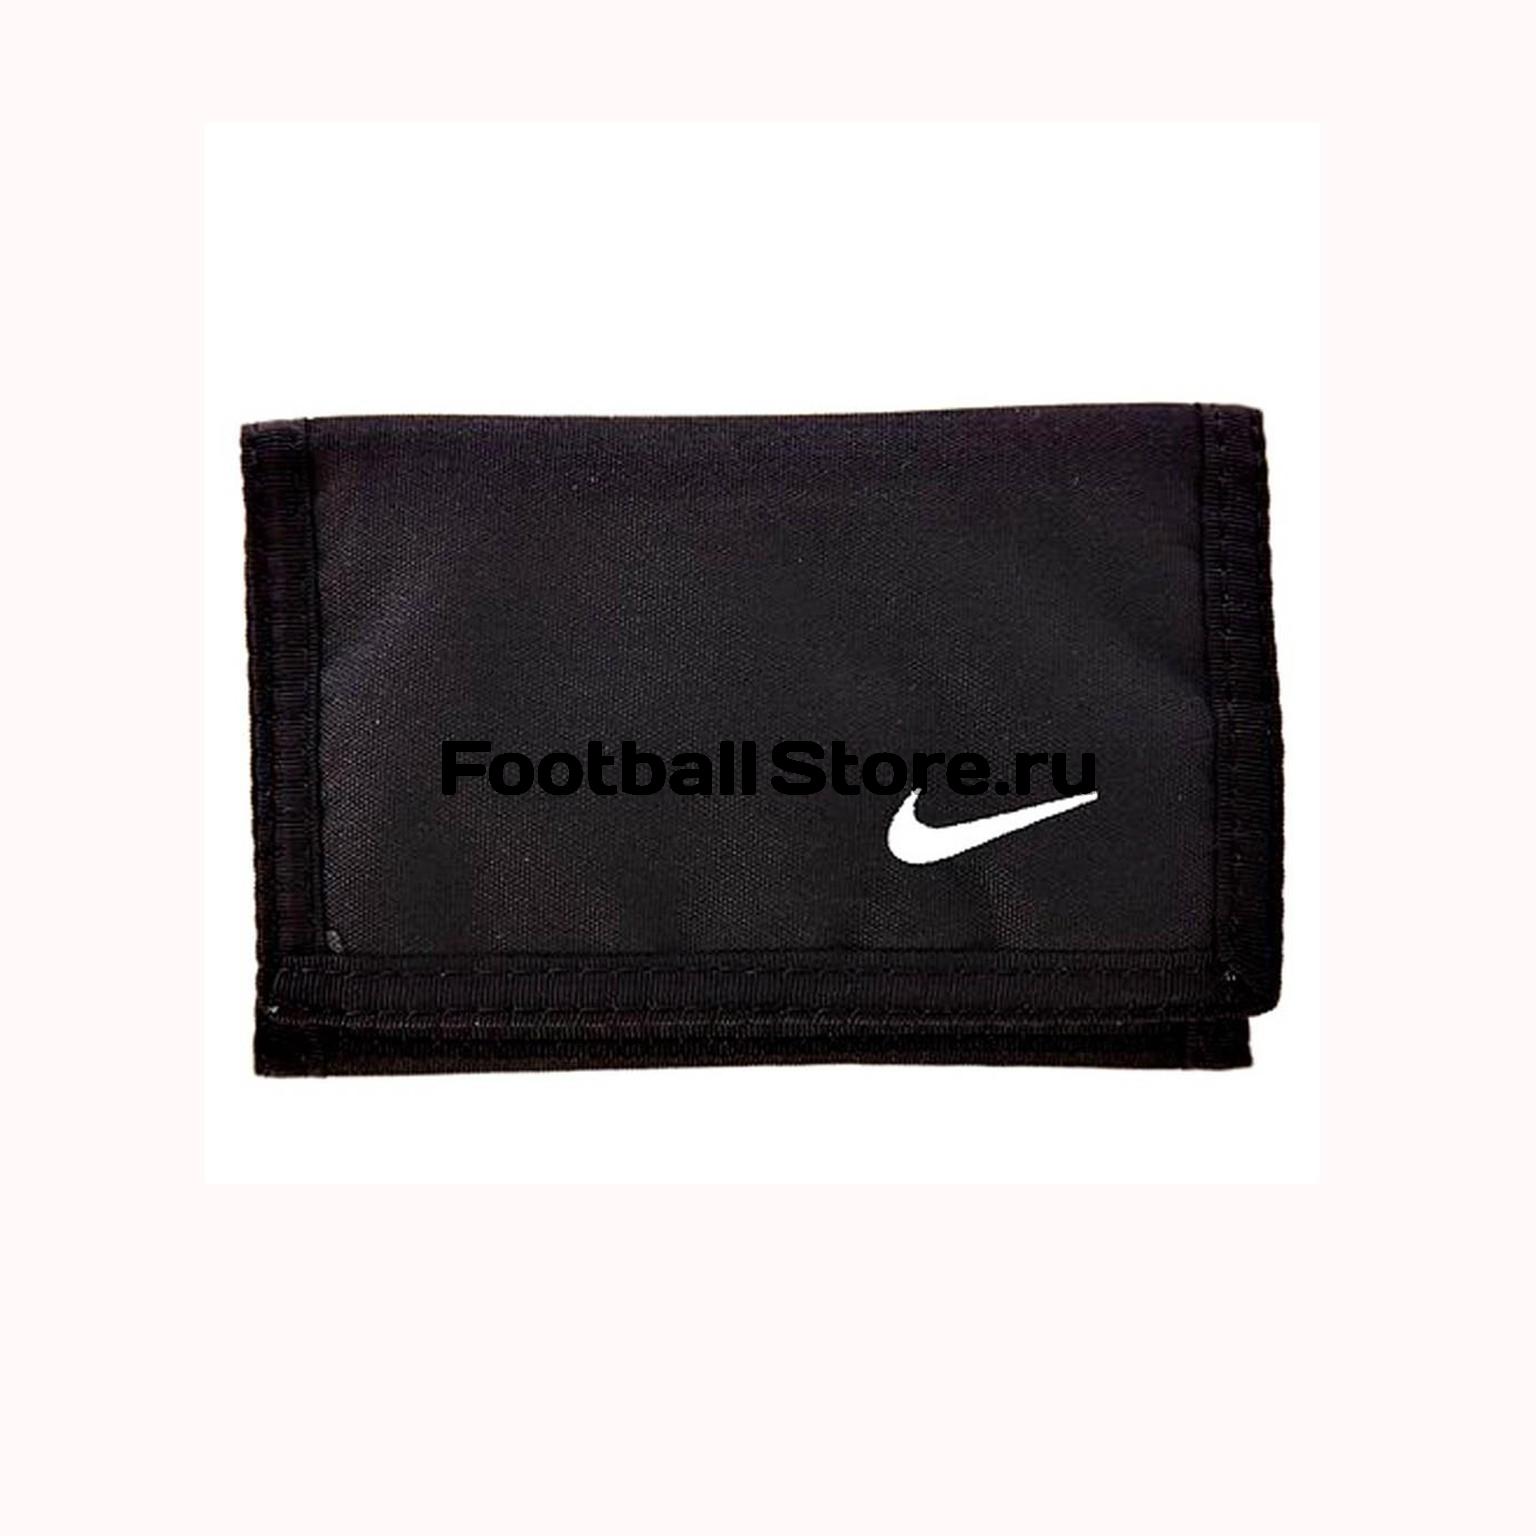 Кошелек Nike Basic Wallet N.IA.08.068.NS cкакалка nike weighted rope 2 0 ns grey black bright citrus